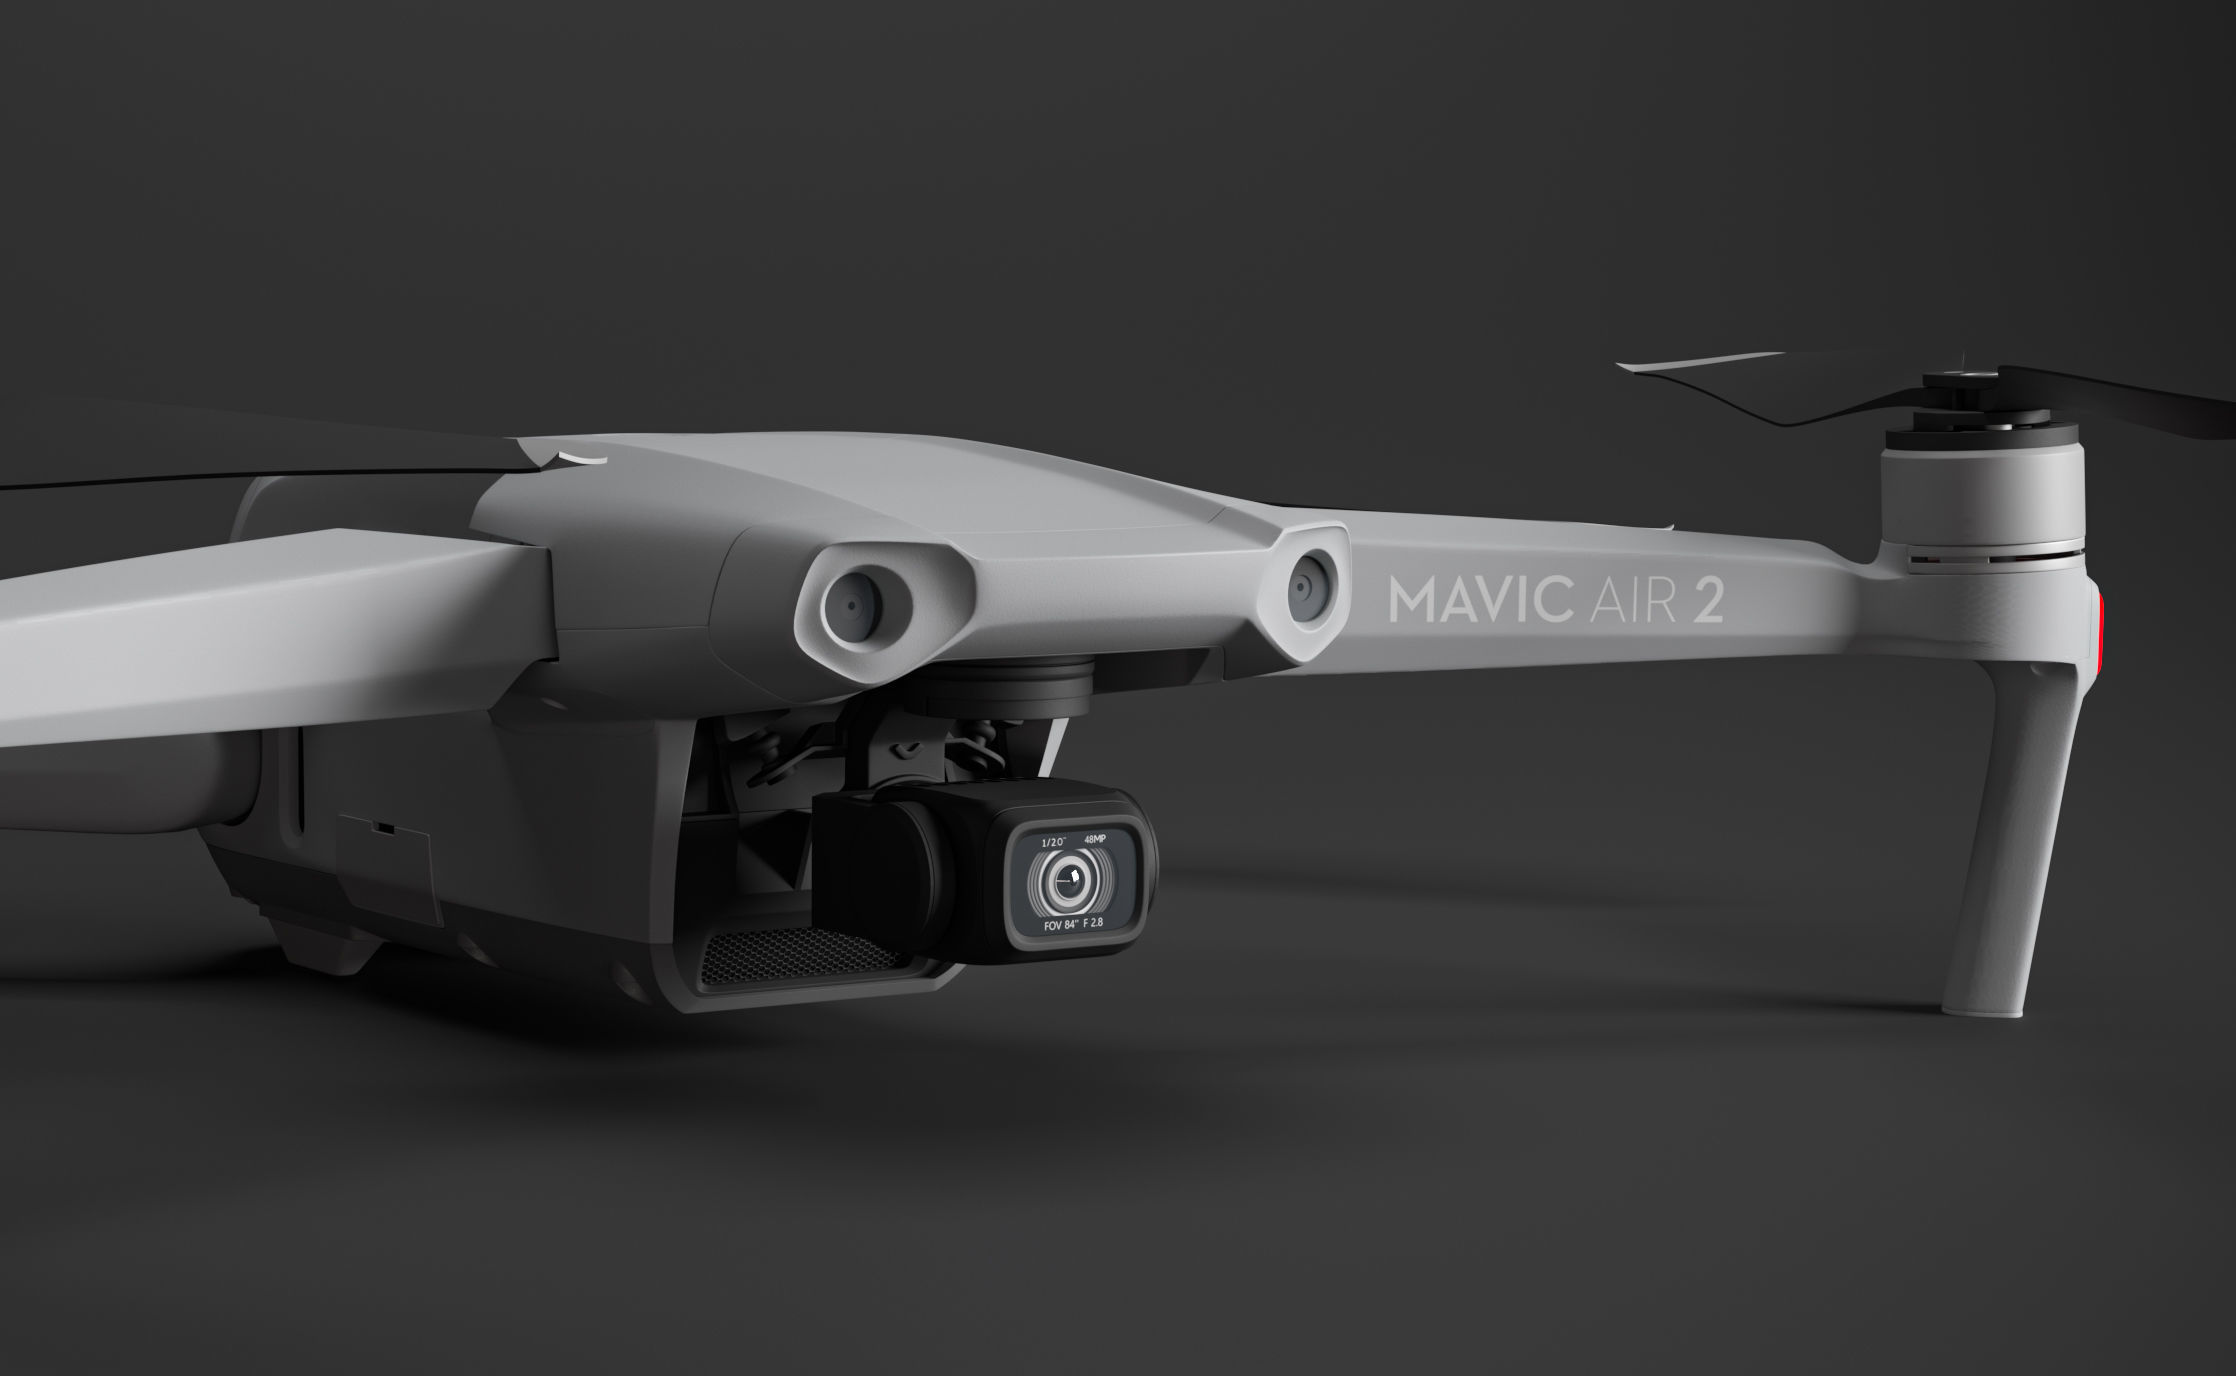 DJI Mavic Air 2 drone with transmitter